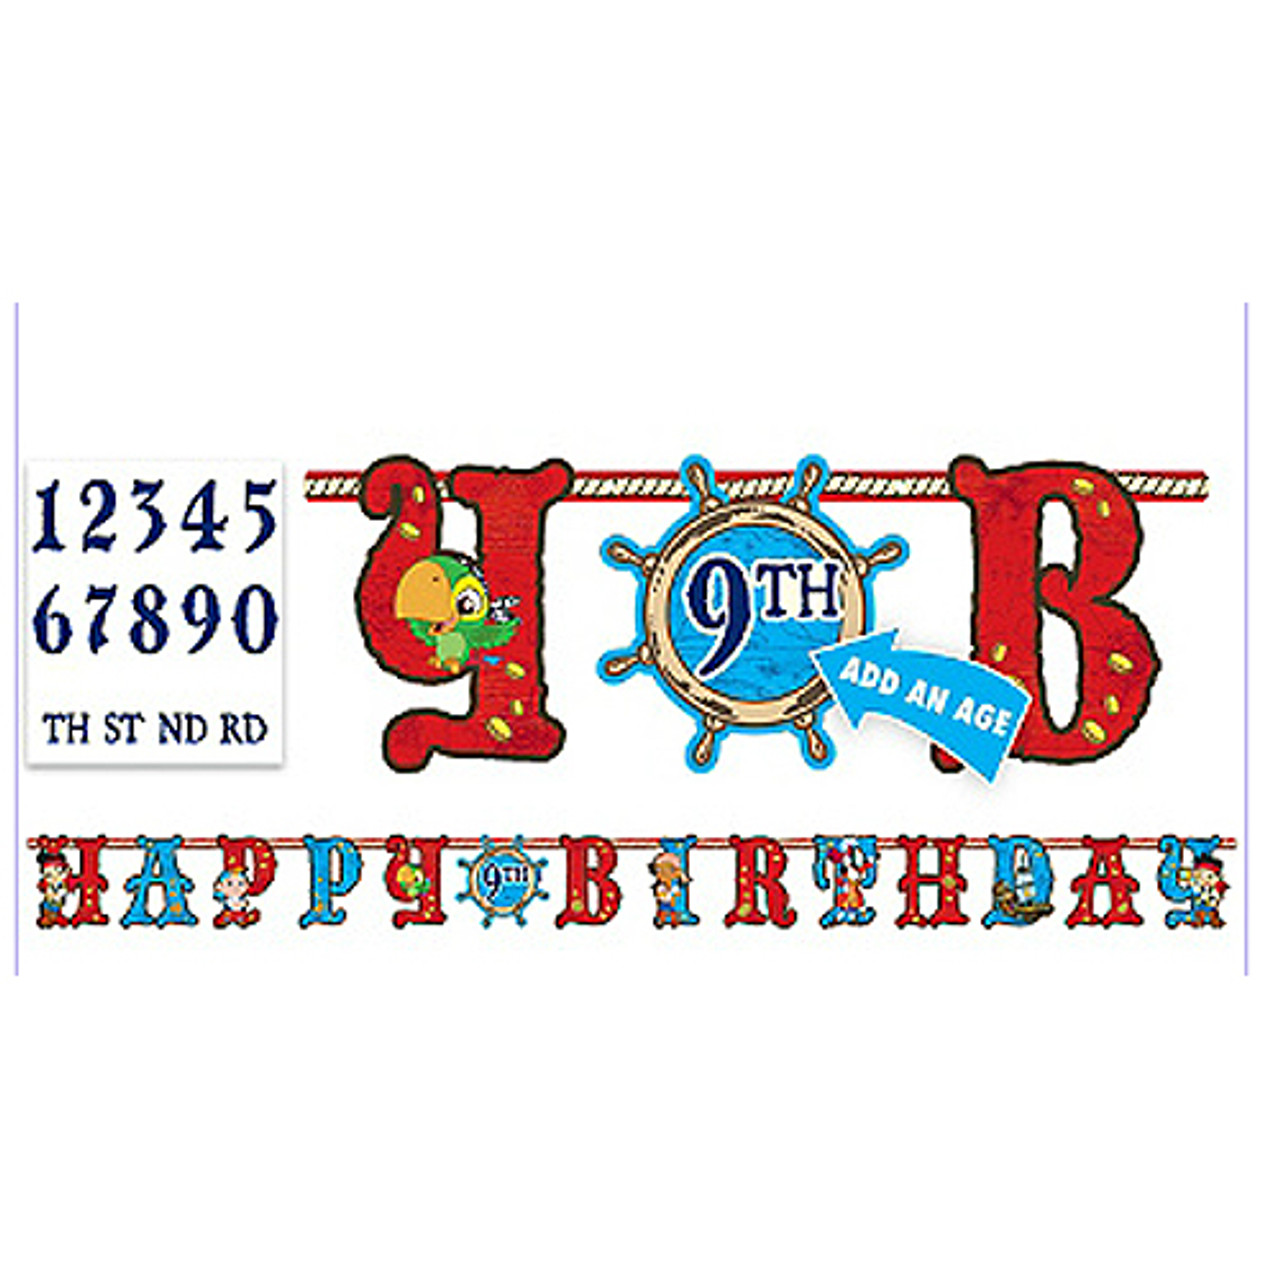 Jake & Never Land Pirates Add An Age Jumbo Letter Banner Kit